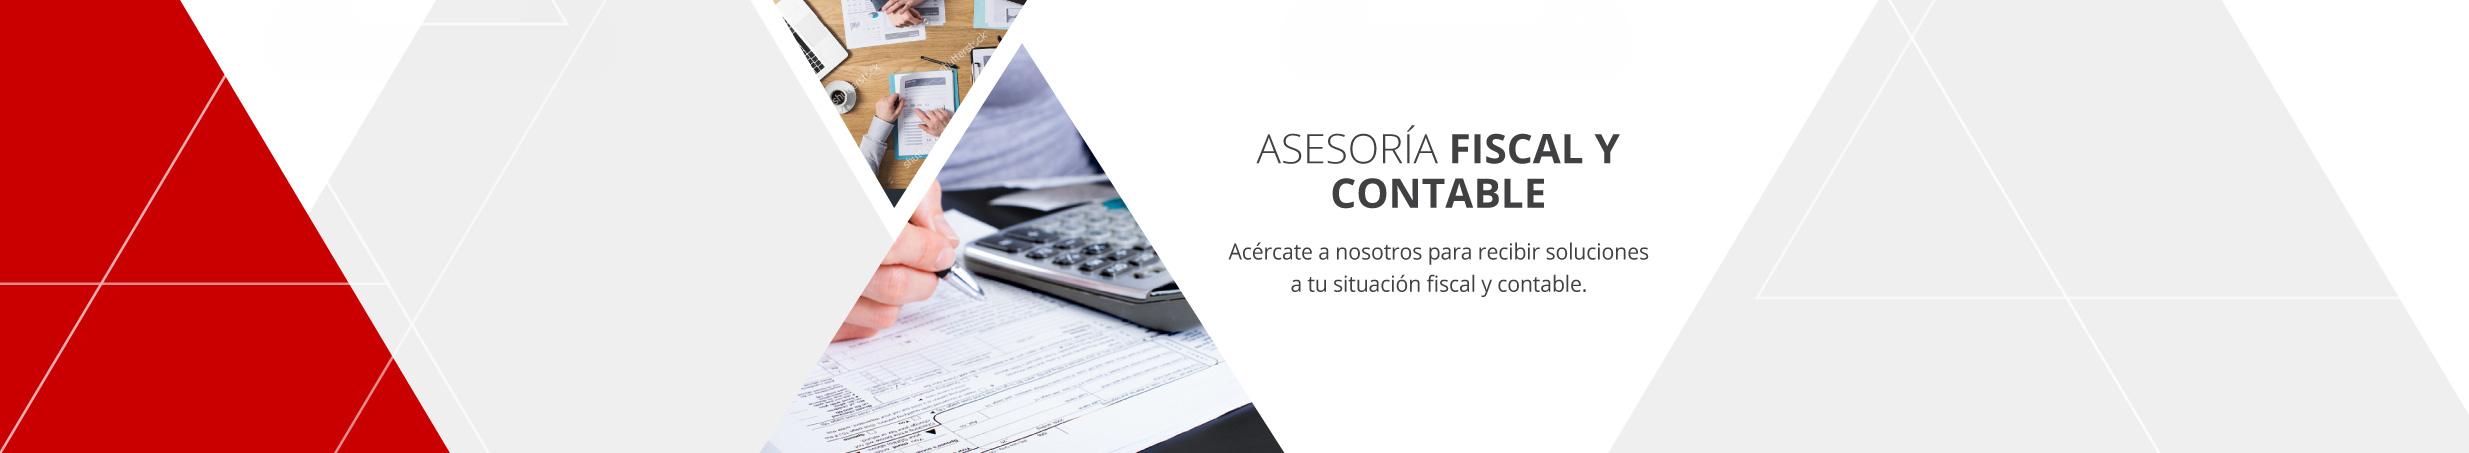 slide-asesoria